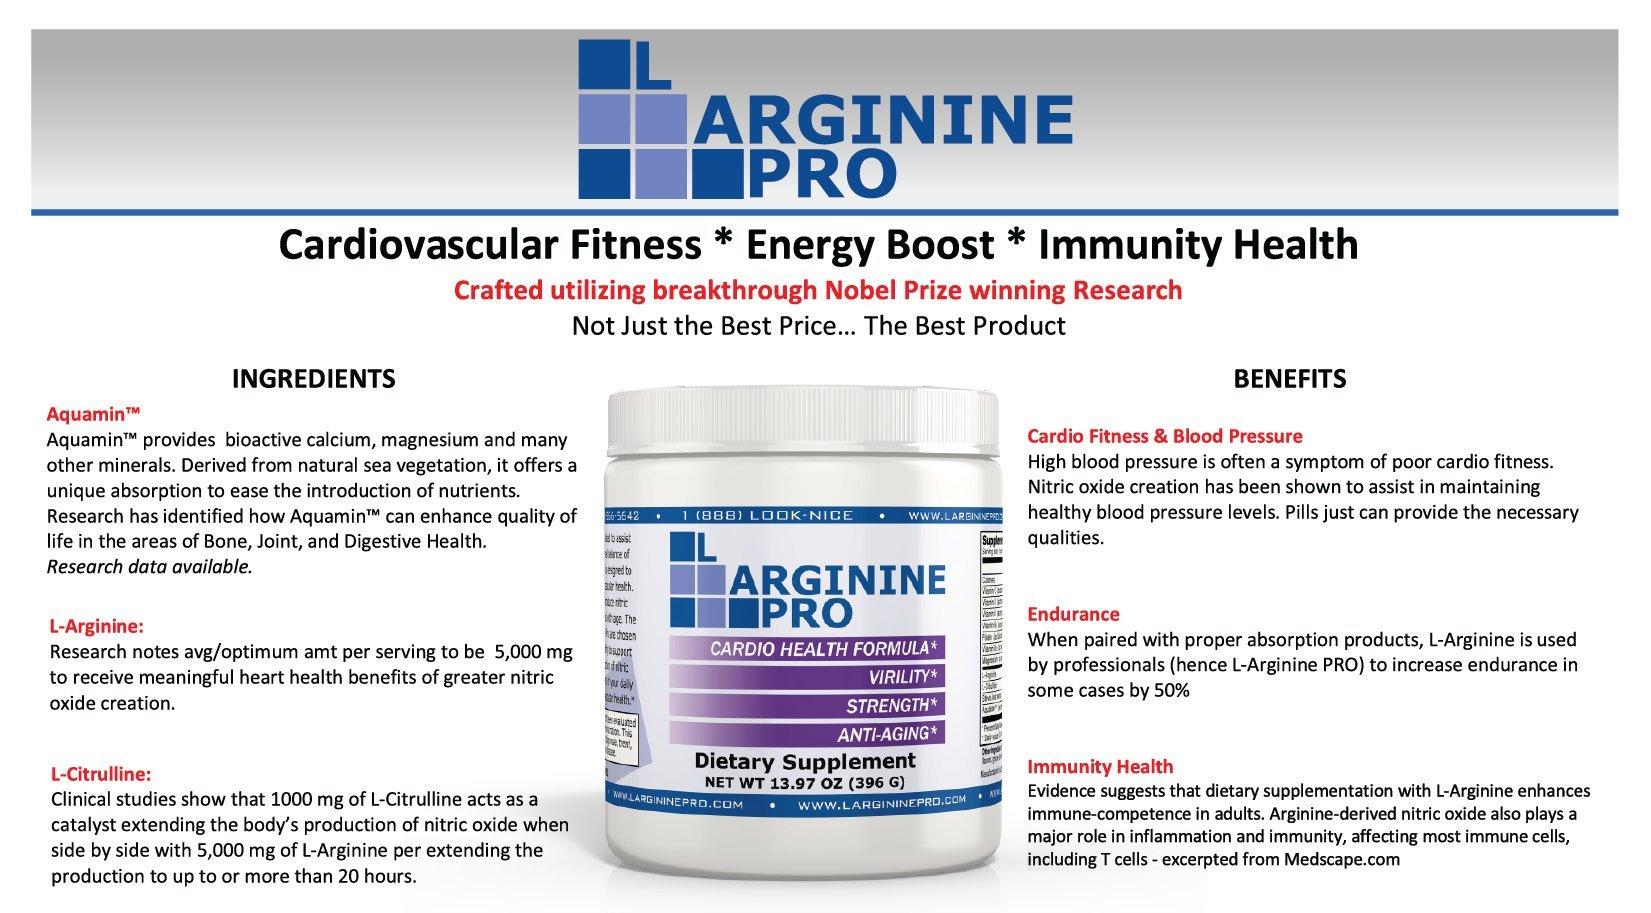 L-arginine Pro, 1 NOW L-arginine Supplement - 5,500mg of L-arginine PLUS 1,100mg L-Citrulline + Vitamins & Minerals for Cardio Health, Blood Pressure, Cholesterol, Energy (Berry, 3 Jars) by L-arginine Pro (Image #6)